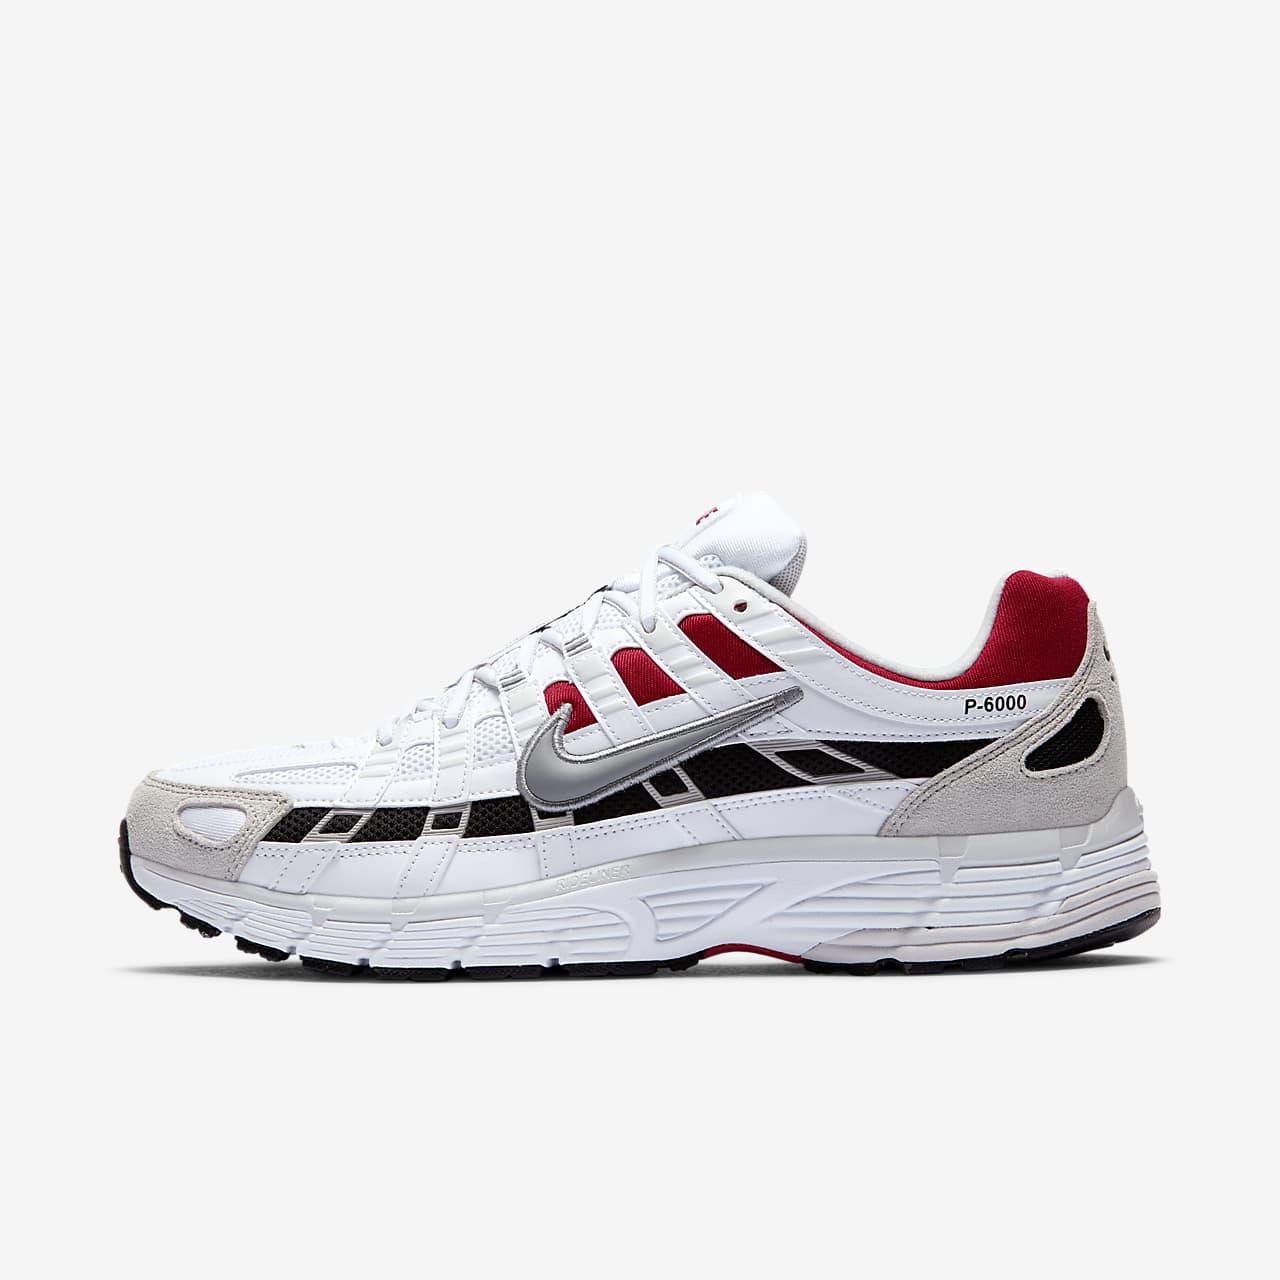 Nike P-6000 Men's Shoe